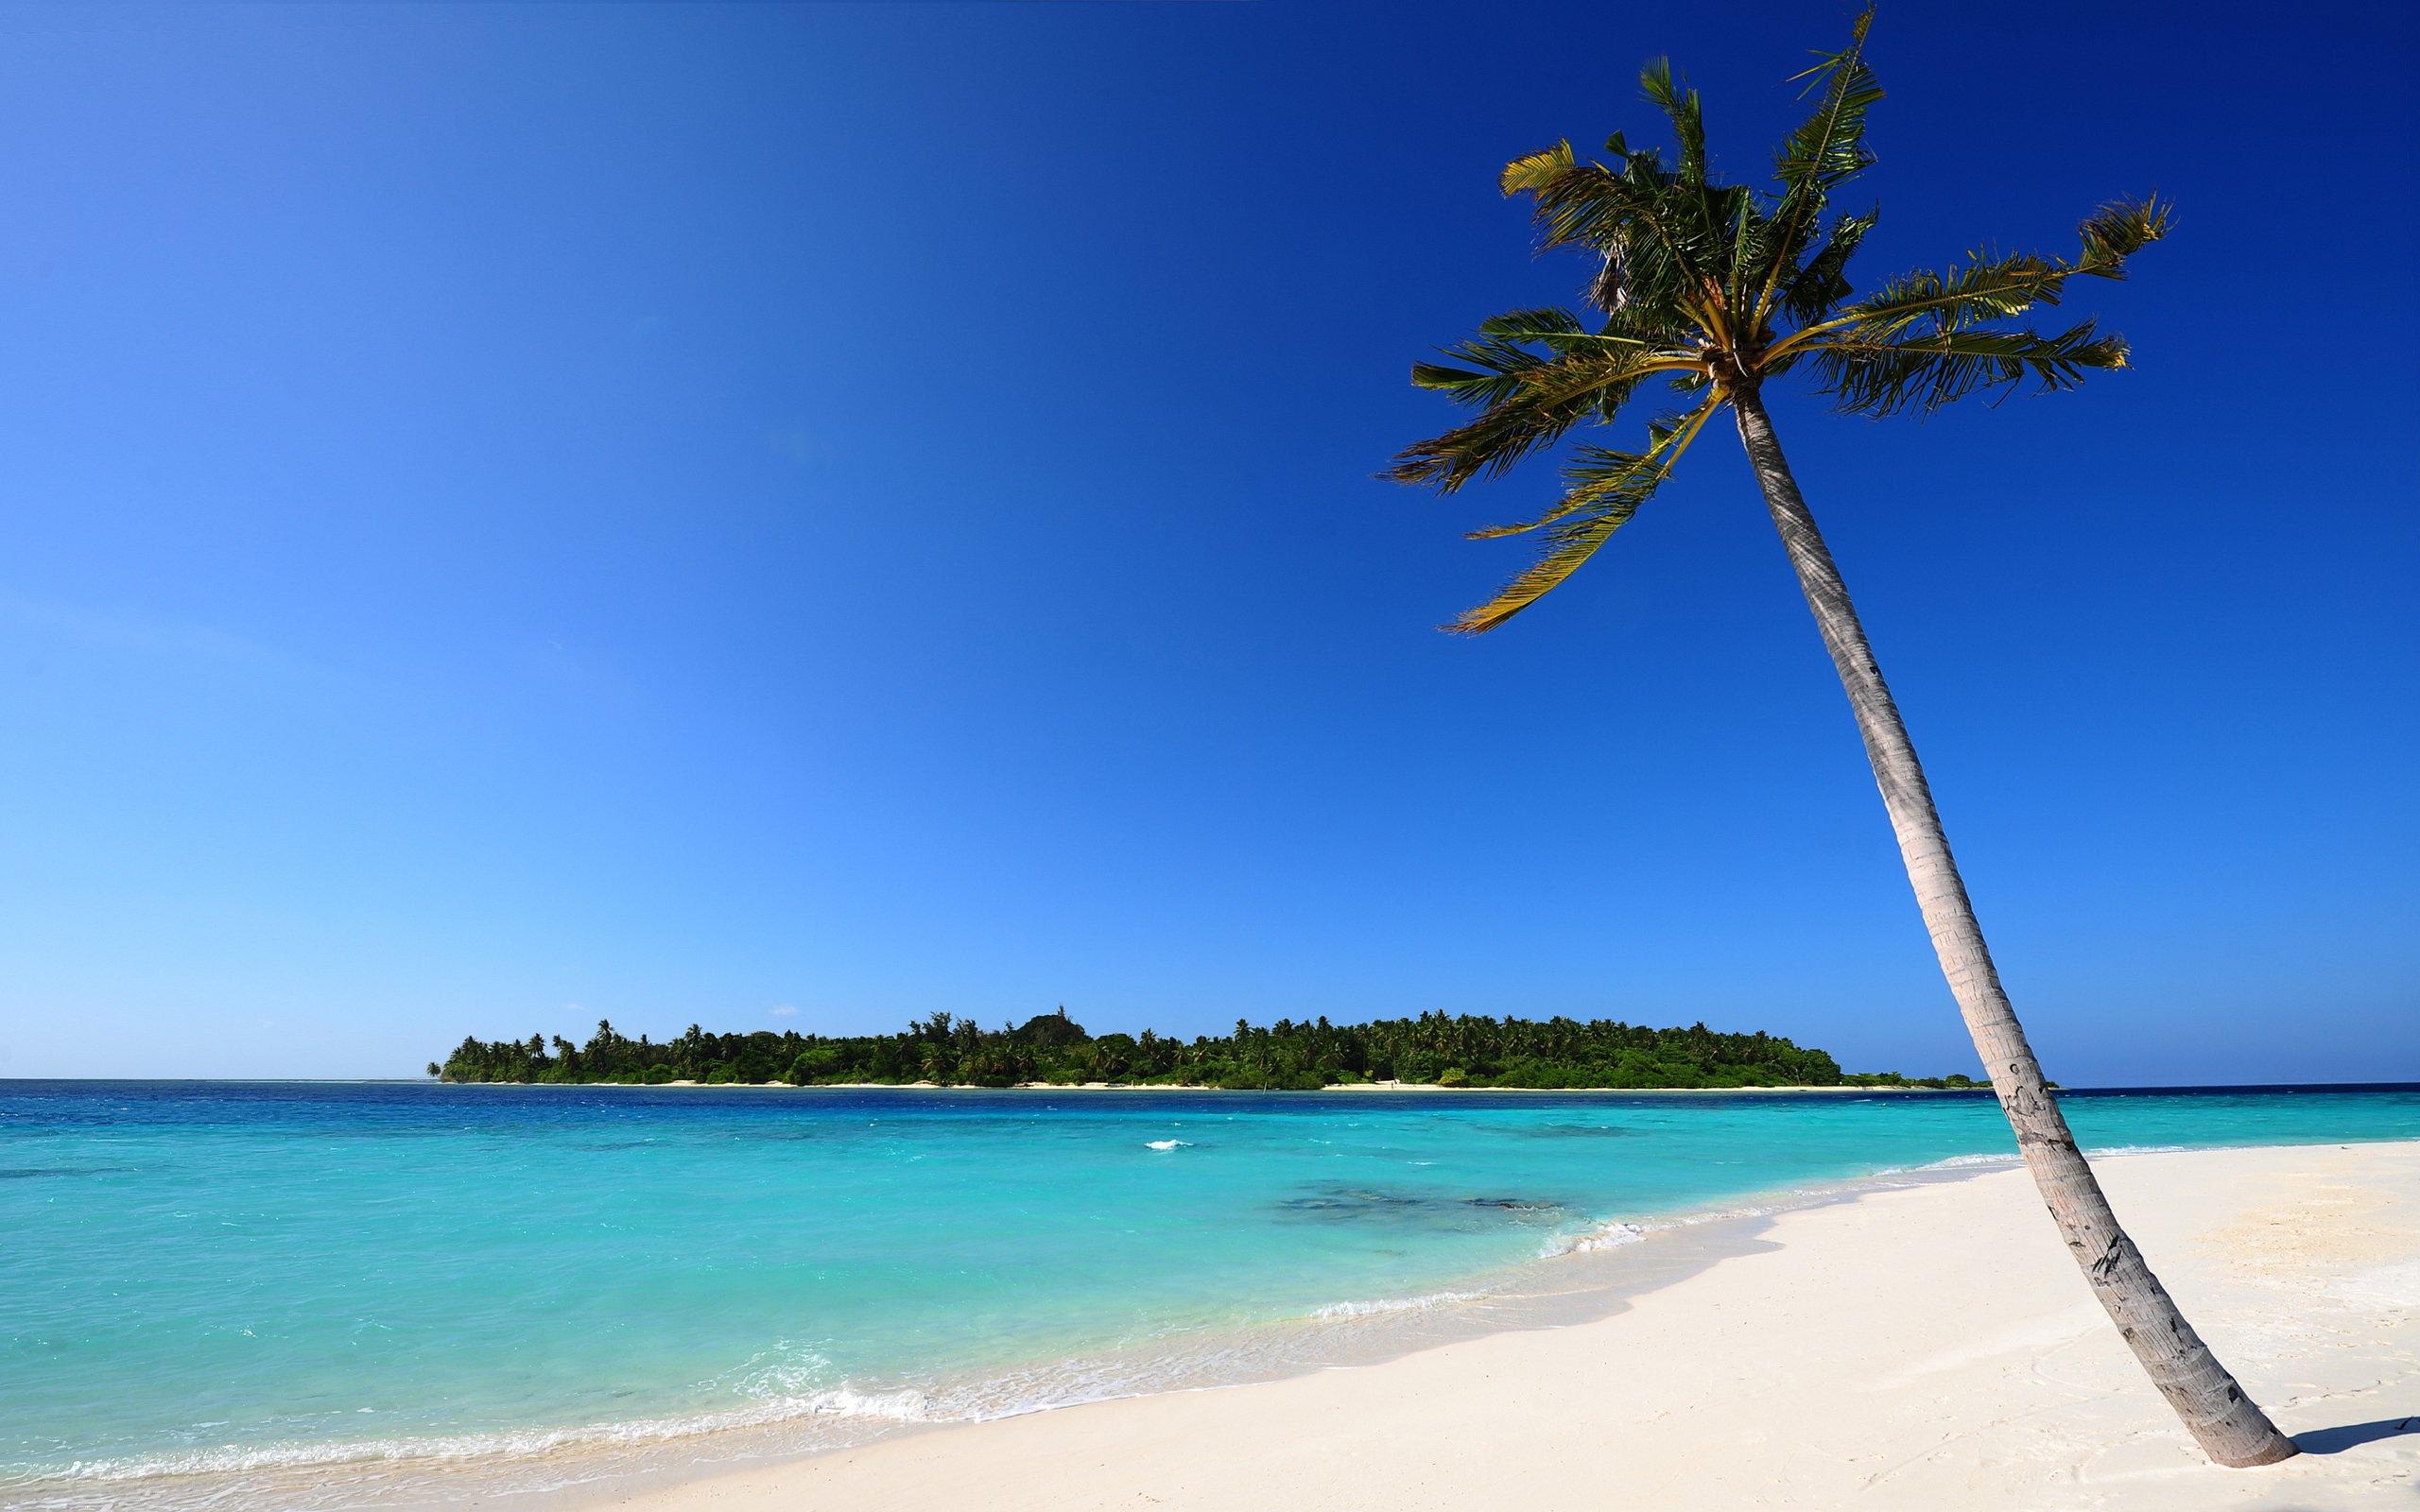 Cool Beach Sand wallpaper 1920x1080 15405 2560x1600